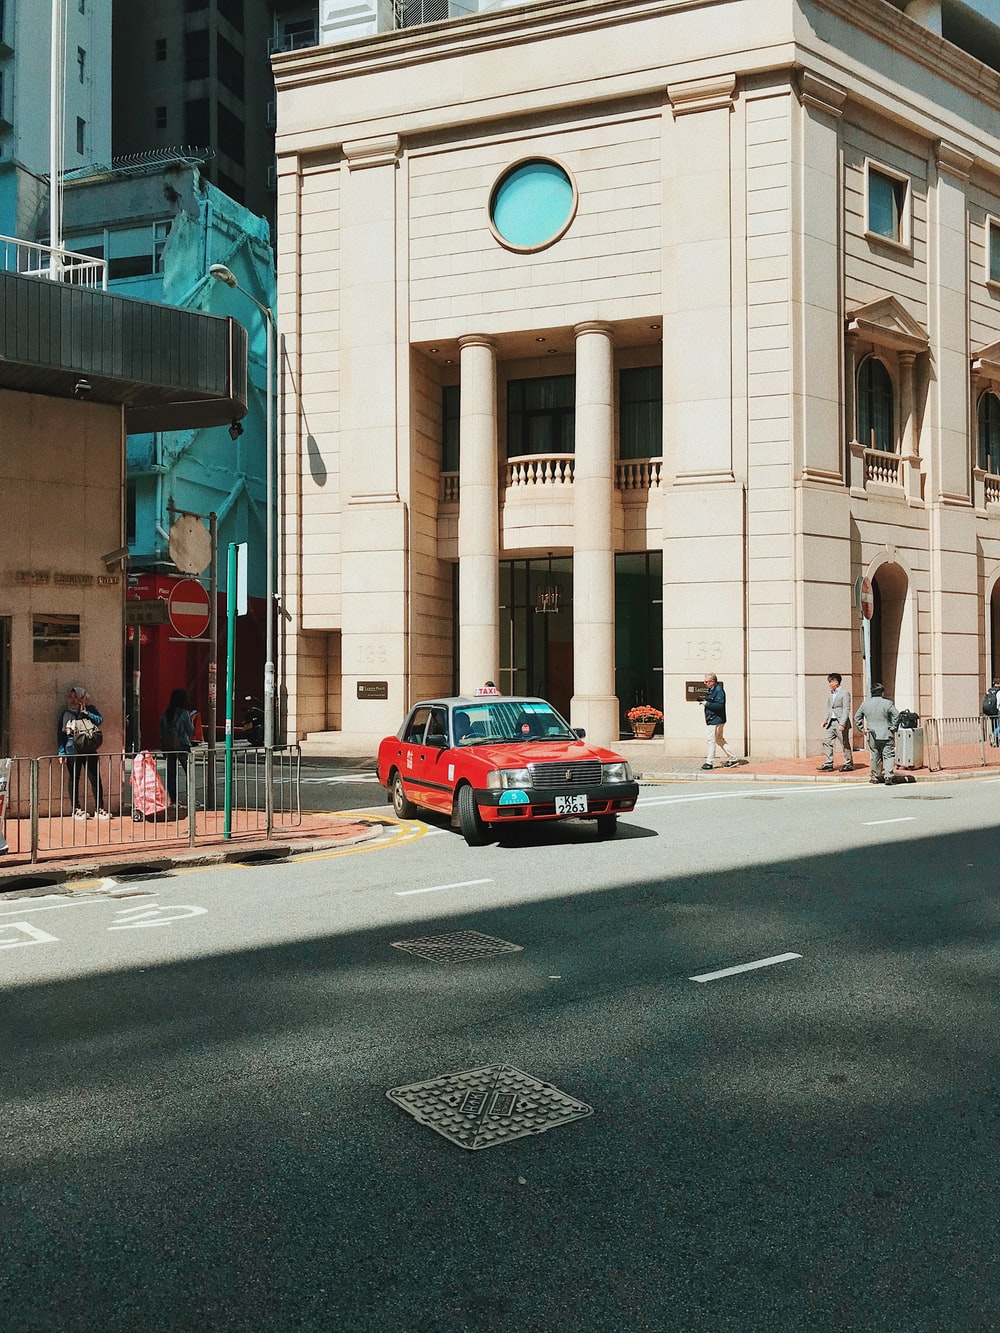 red car near building